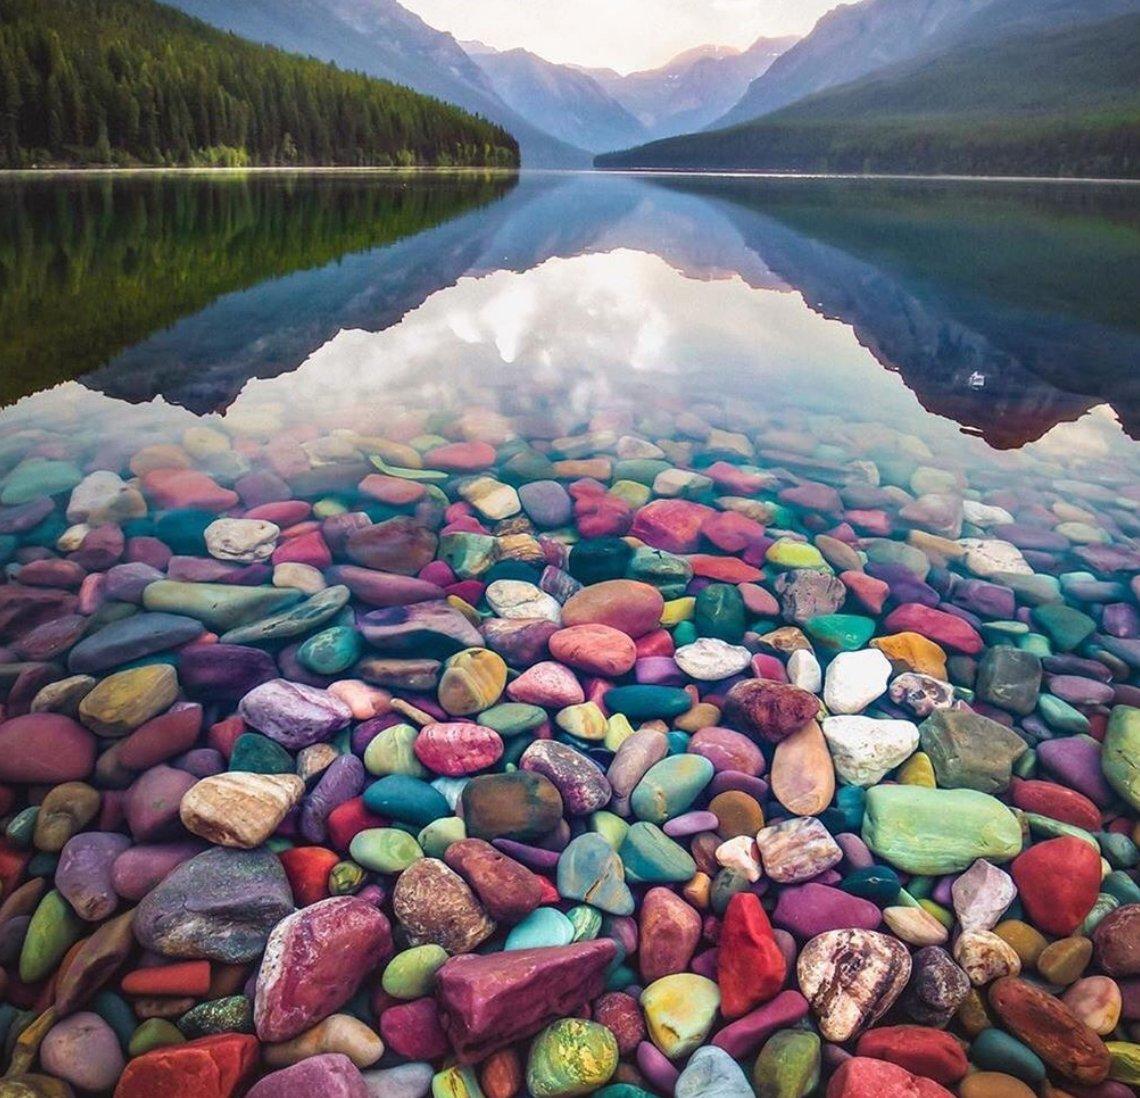 #SearchForBeauty-08/08/2020 #LakeMcDonald #GlacierNationalPark, #Montana #travellingthroughtheworld https://www.instagram.com/p/CDoxDyyJmO-/pic.twitter.com/M5LVjDFGTG